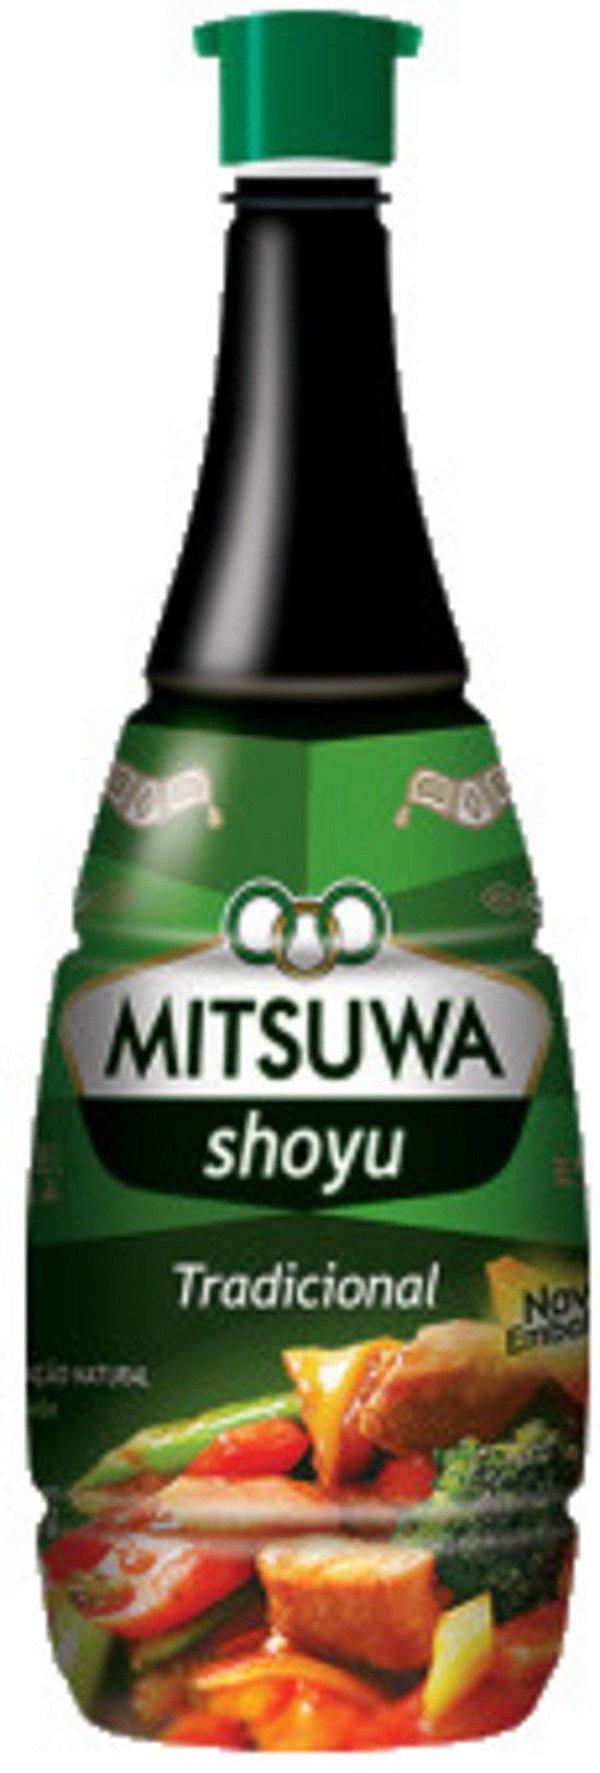 Molho de Soja Shoyu Tradicional 900ml Mitsuwa